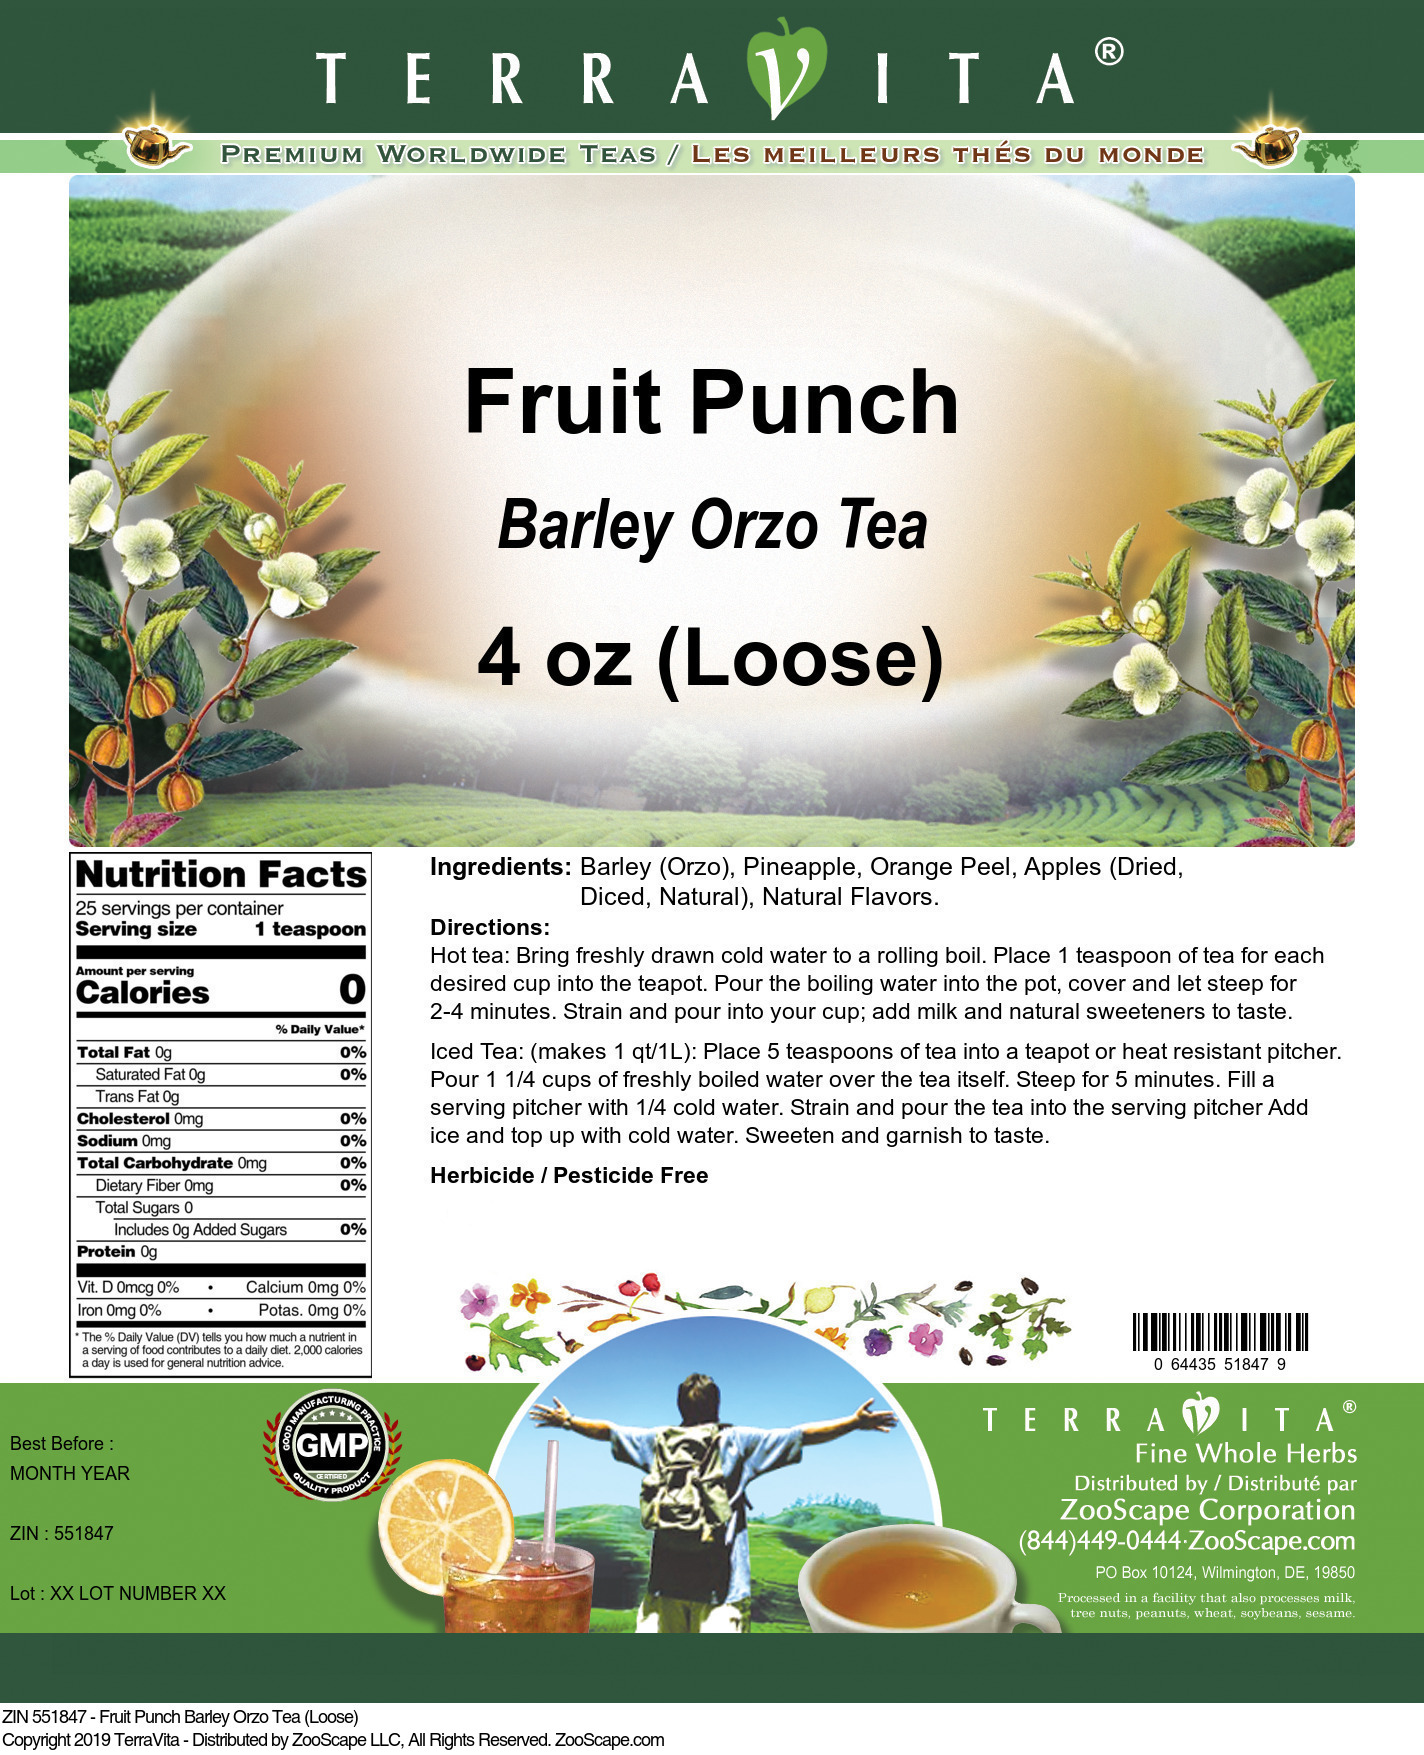 Fruit Punch Barley Orzo Tea (Loose)